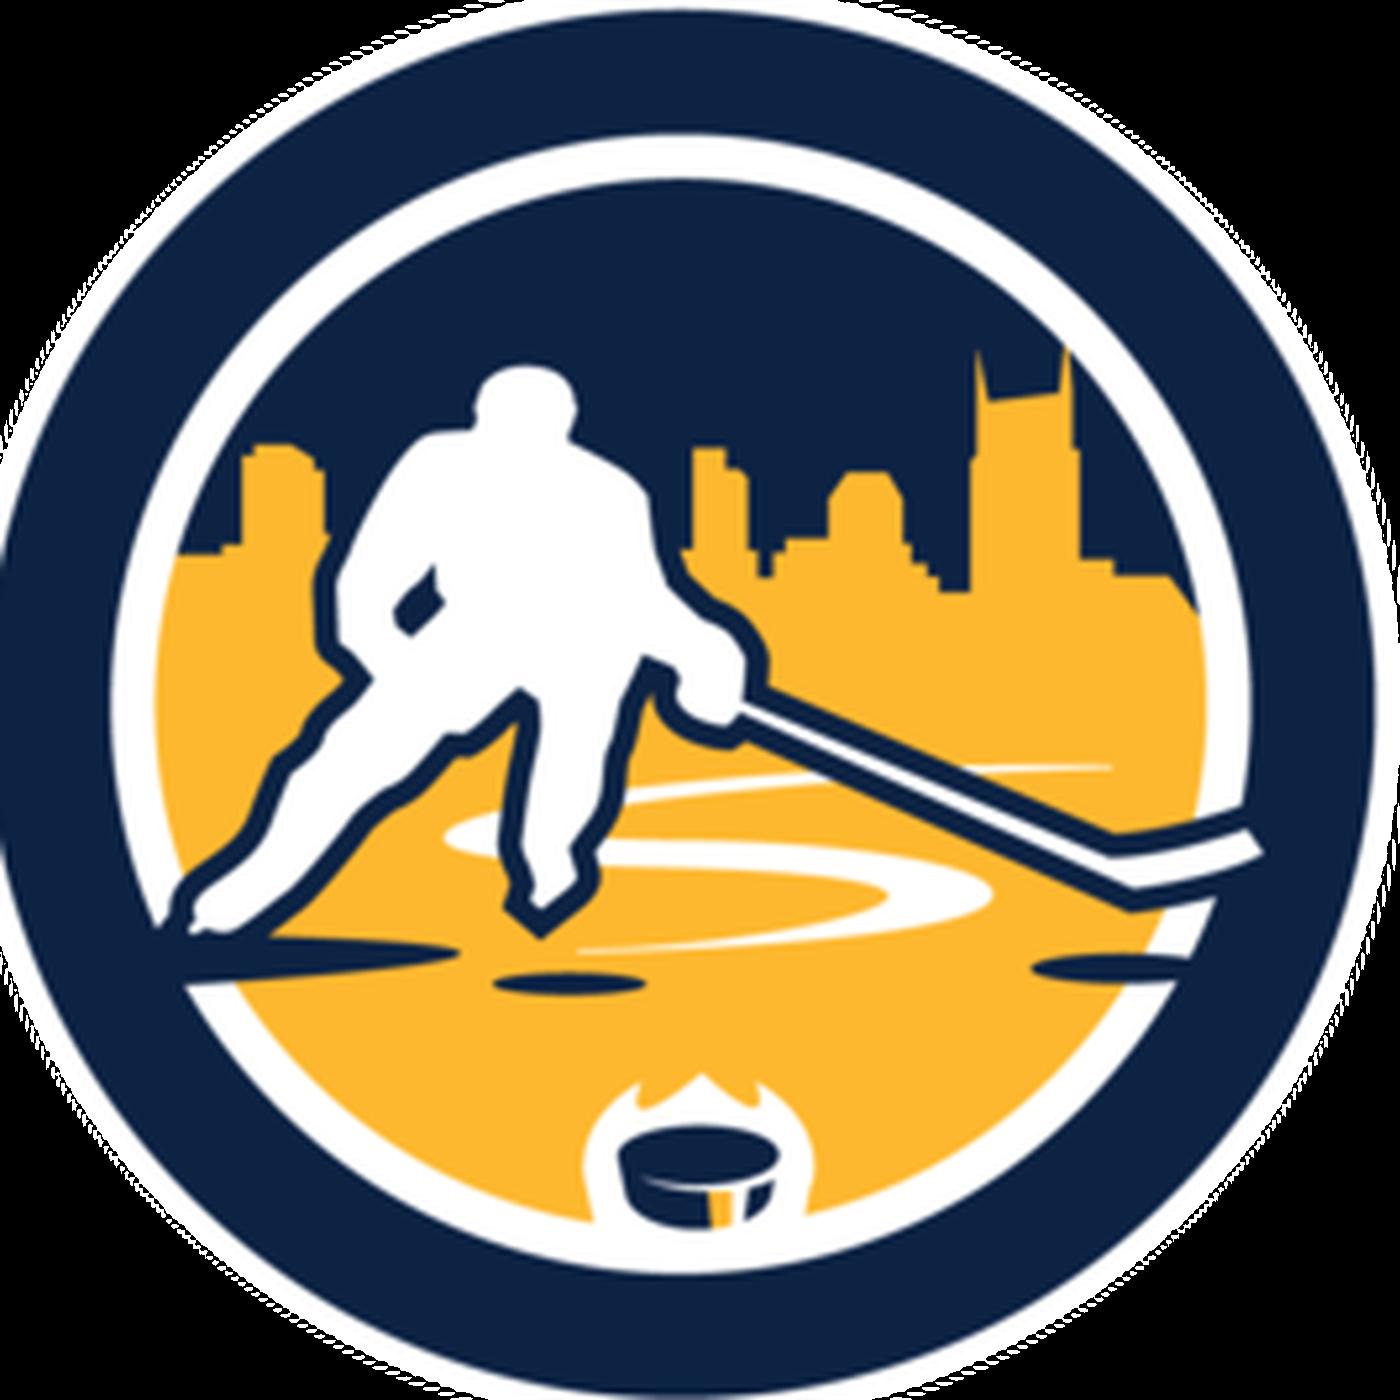 Predators baseball clipart image transparent library Google Calendar now features sports schedules, including NHL - On ... image transparent library